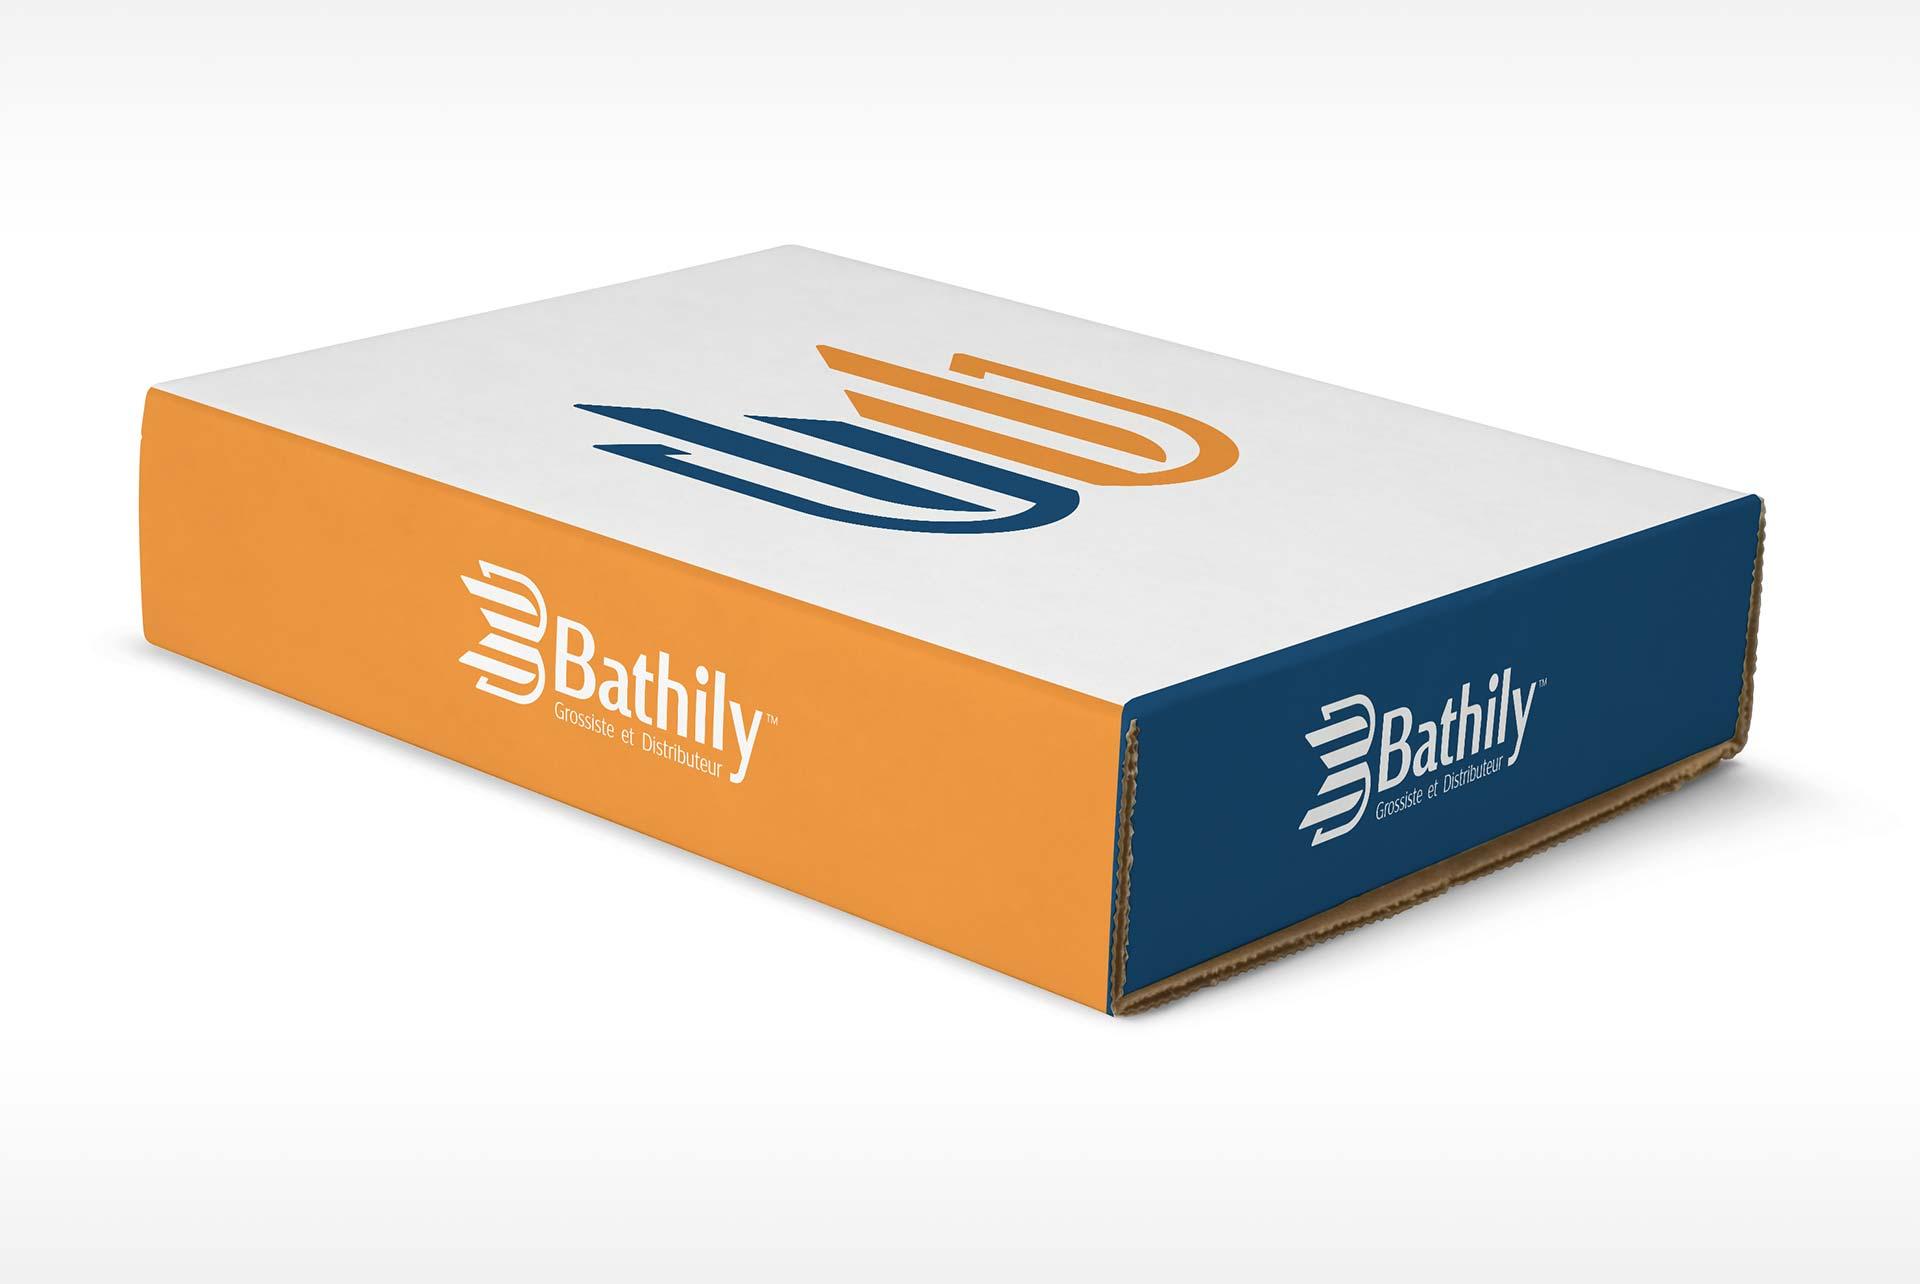 Bathily logo design presented on a box